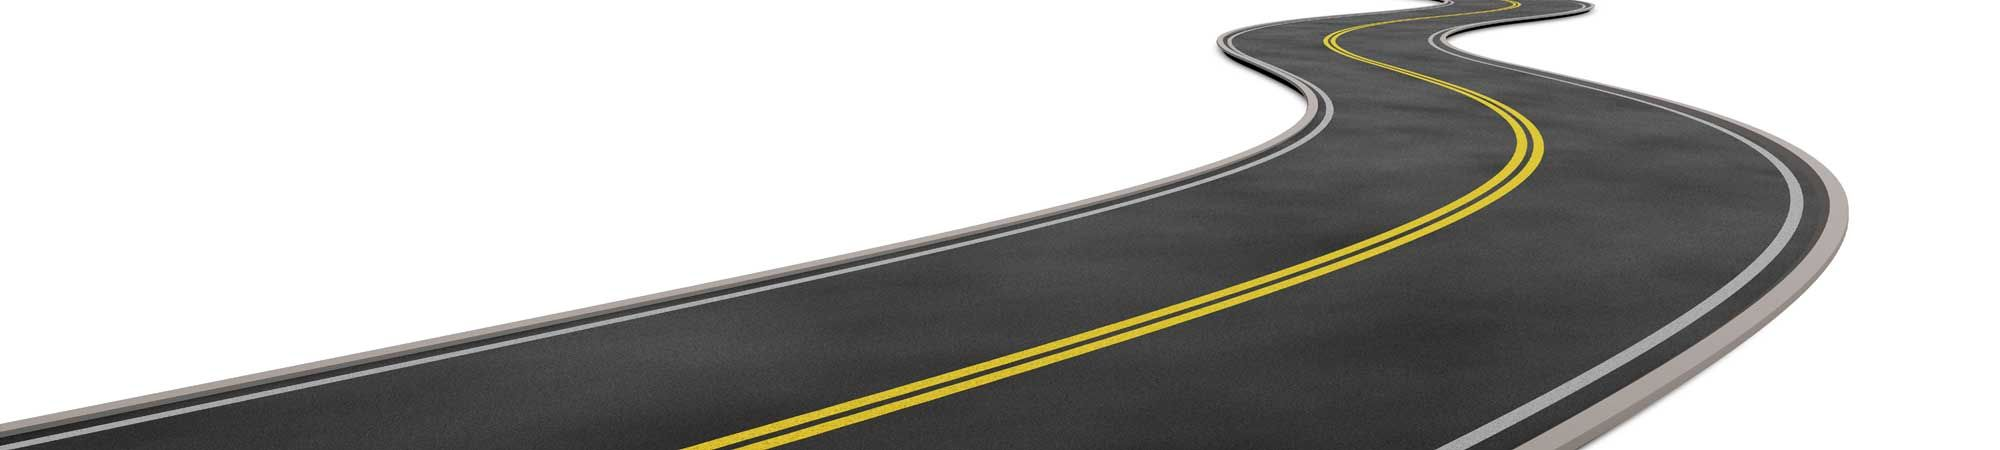 Curve Road Clipart Curve road clipart curved road ...